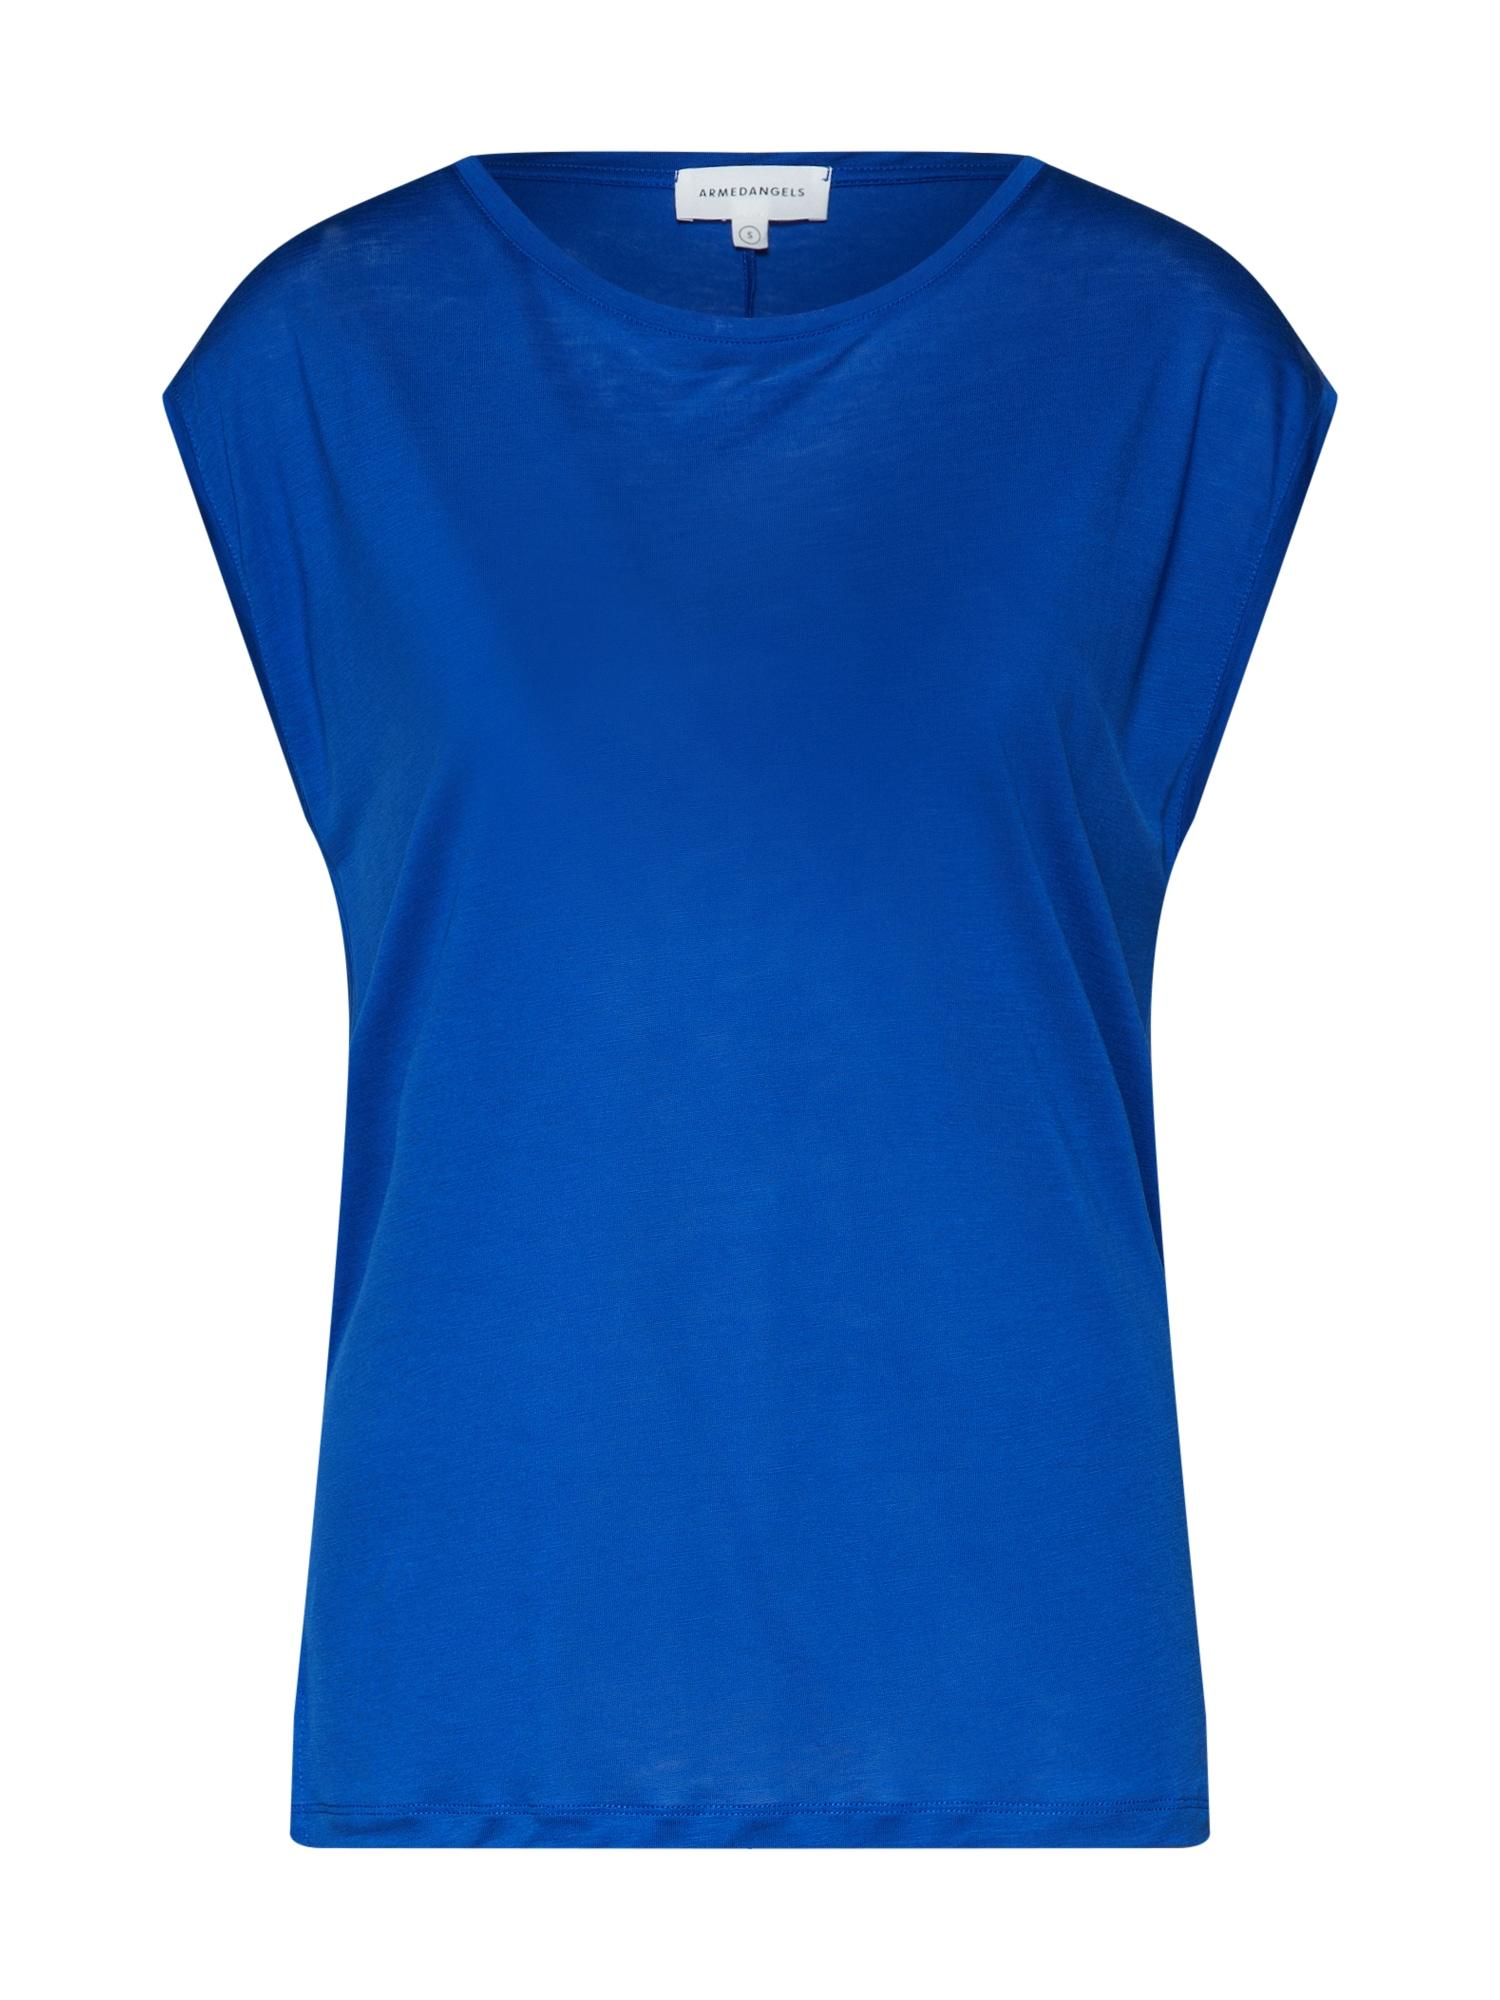 Tričko Jil královská modrá ARMEDANGELS